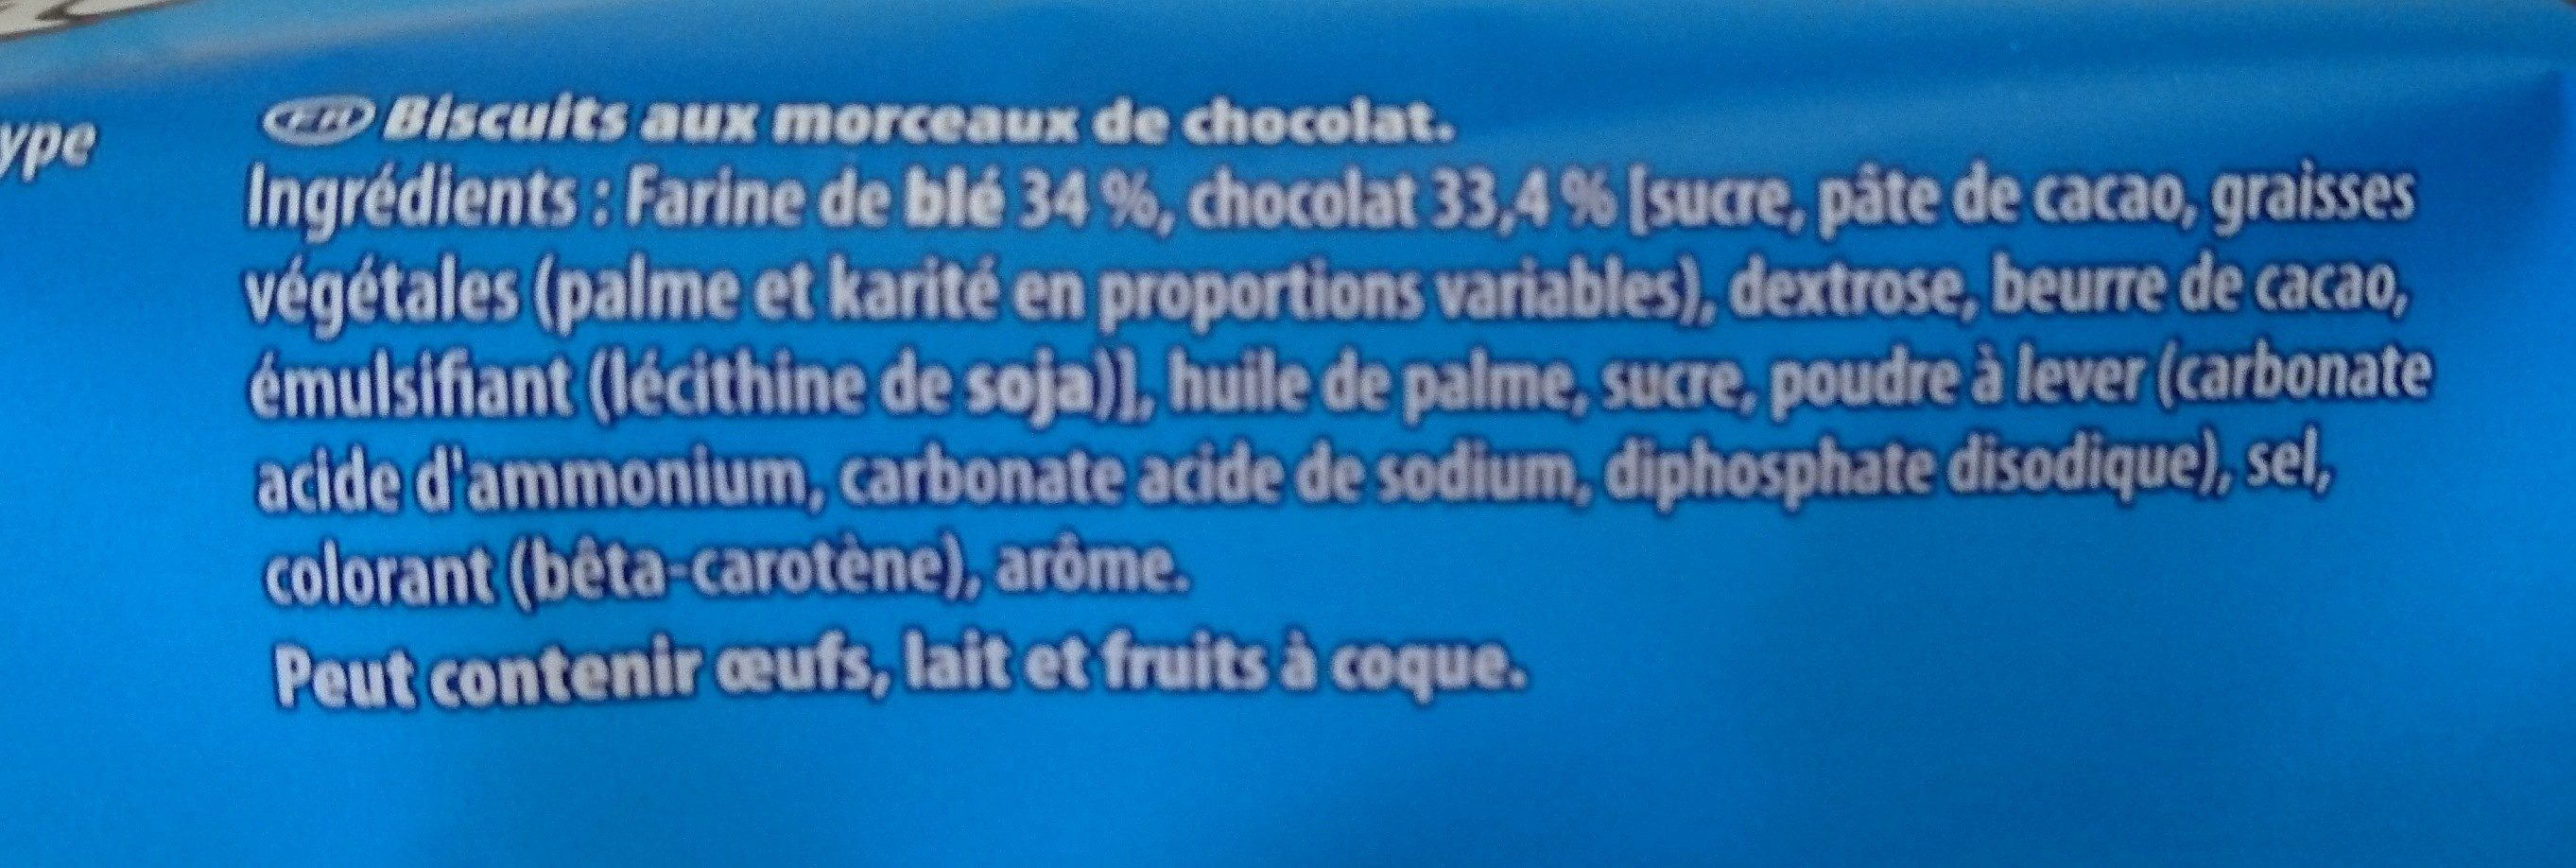 Granola - Ingrédients - fr